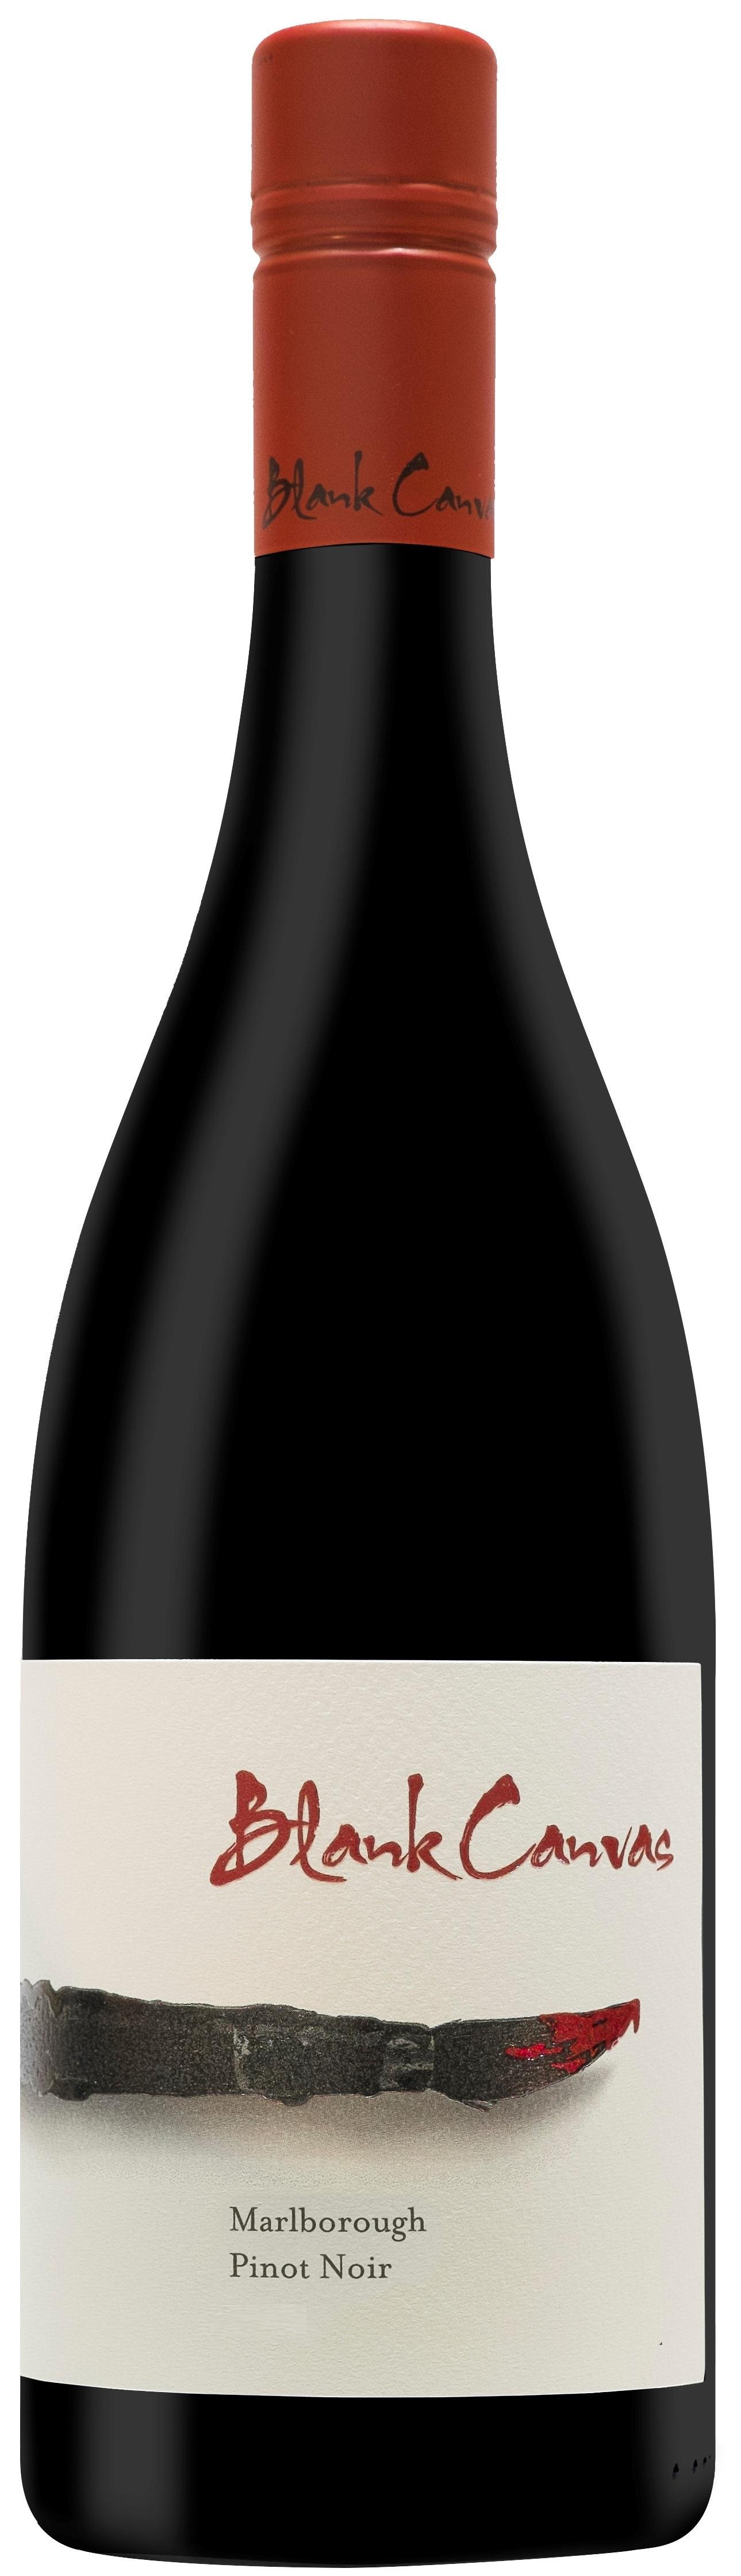 Blank Canvas, Marlborough Pinot Noir 2015